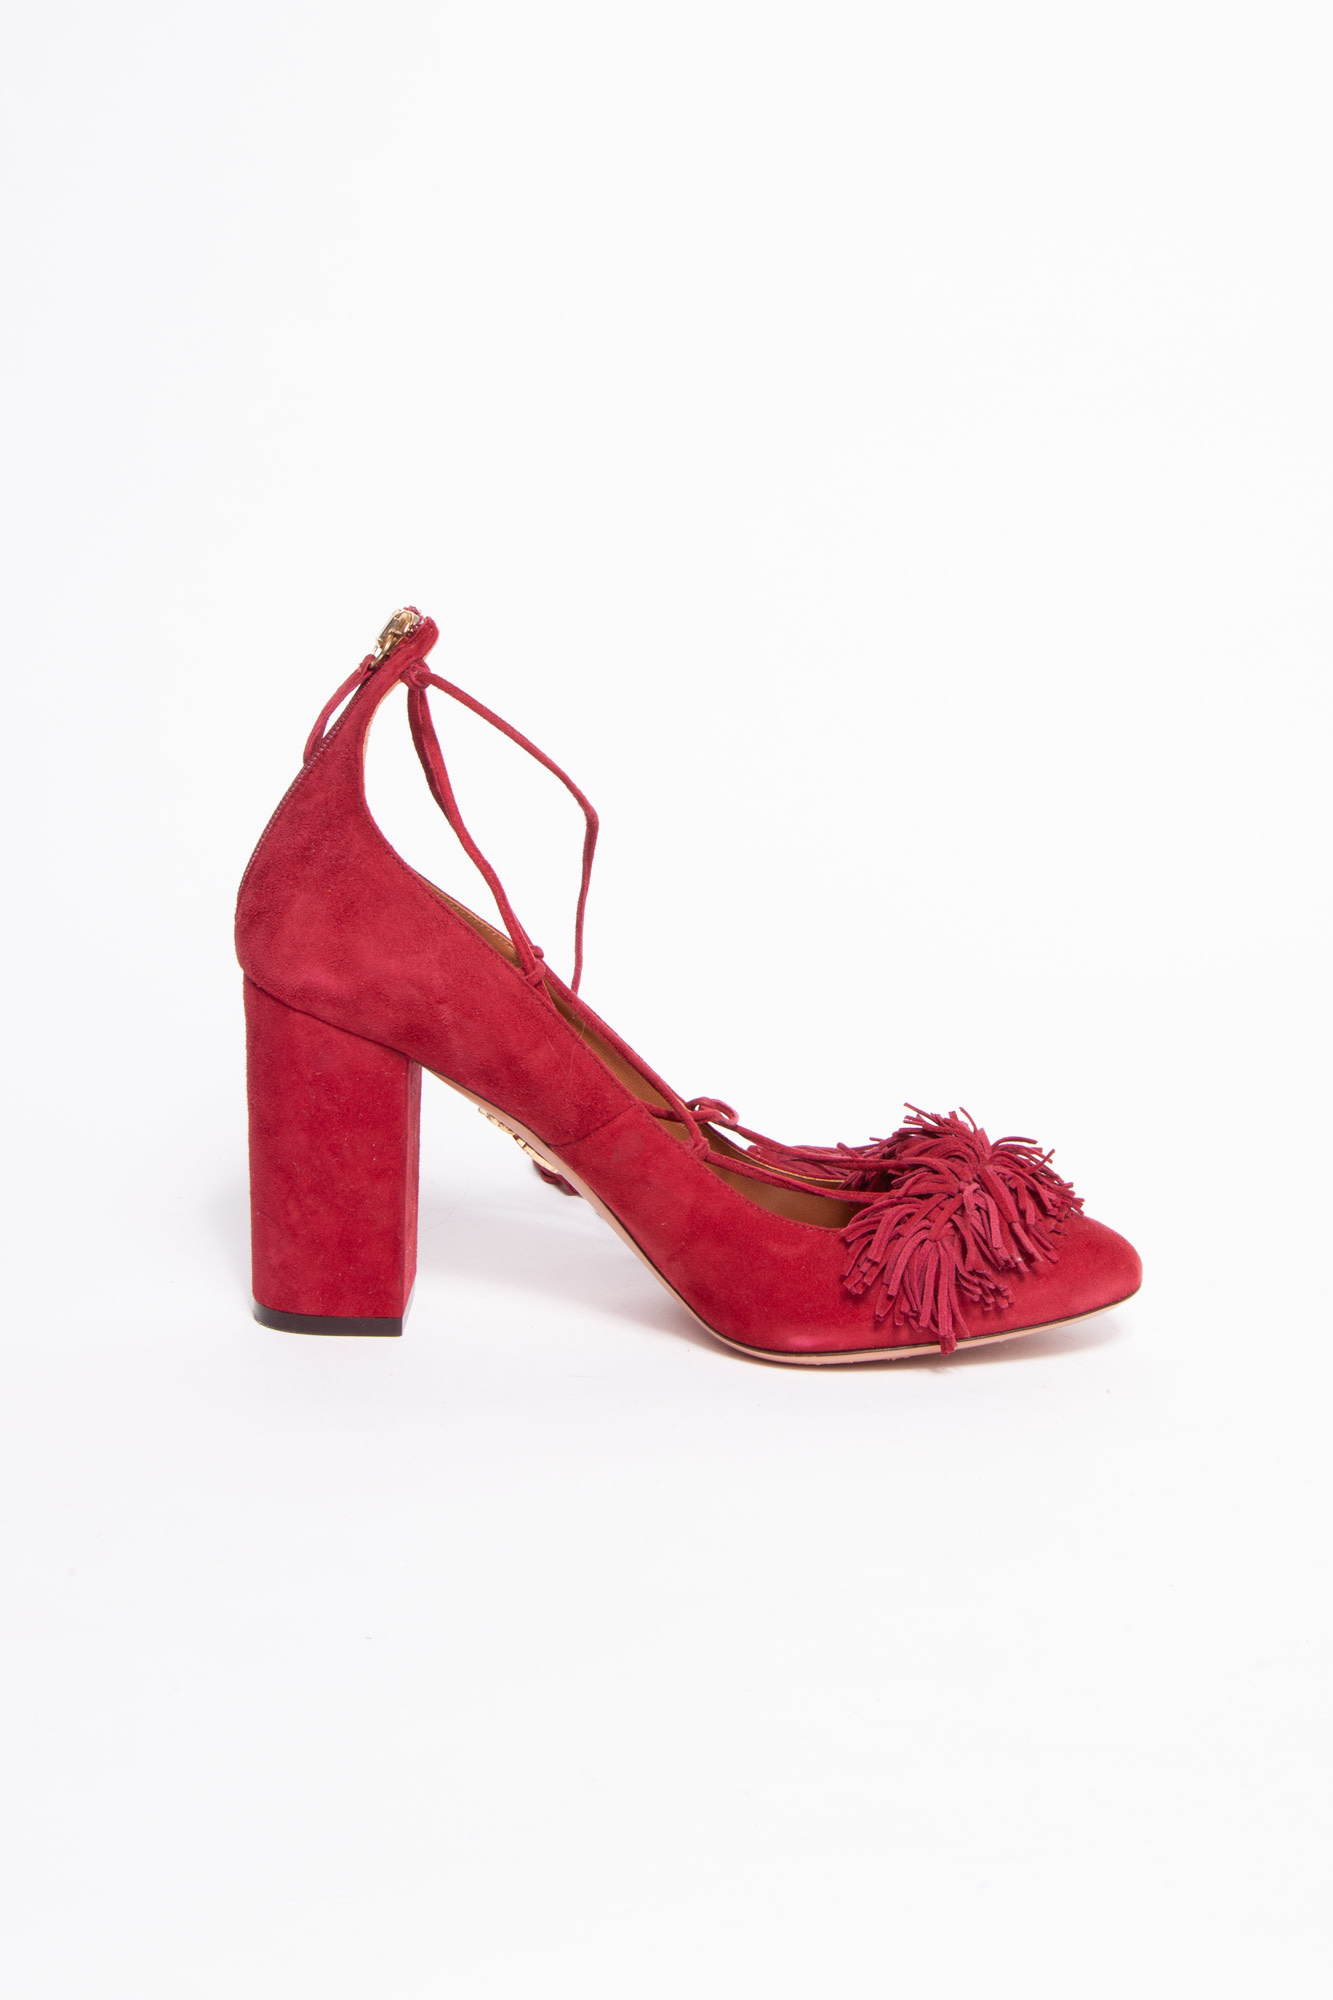 Aquazzura  RED SUEDE HEELED SHOES